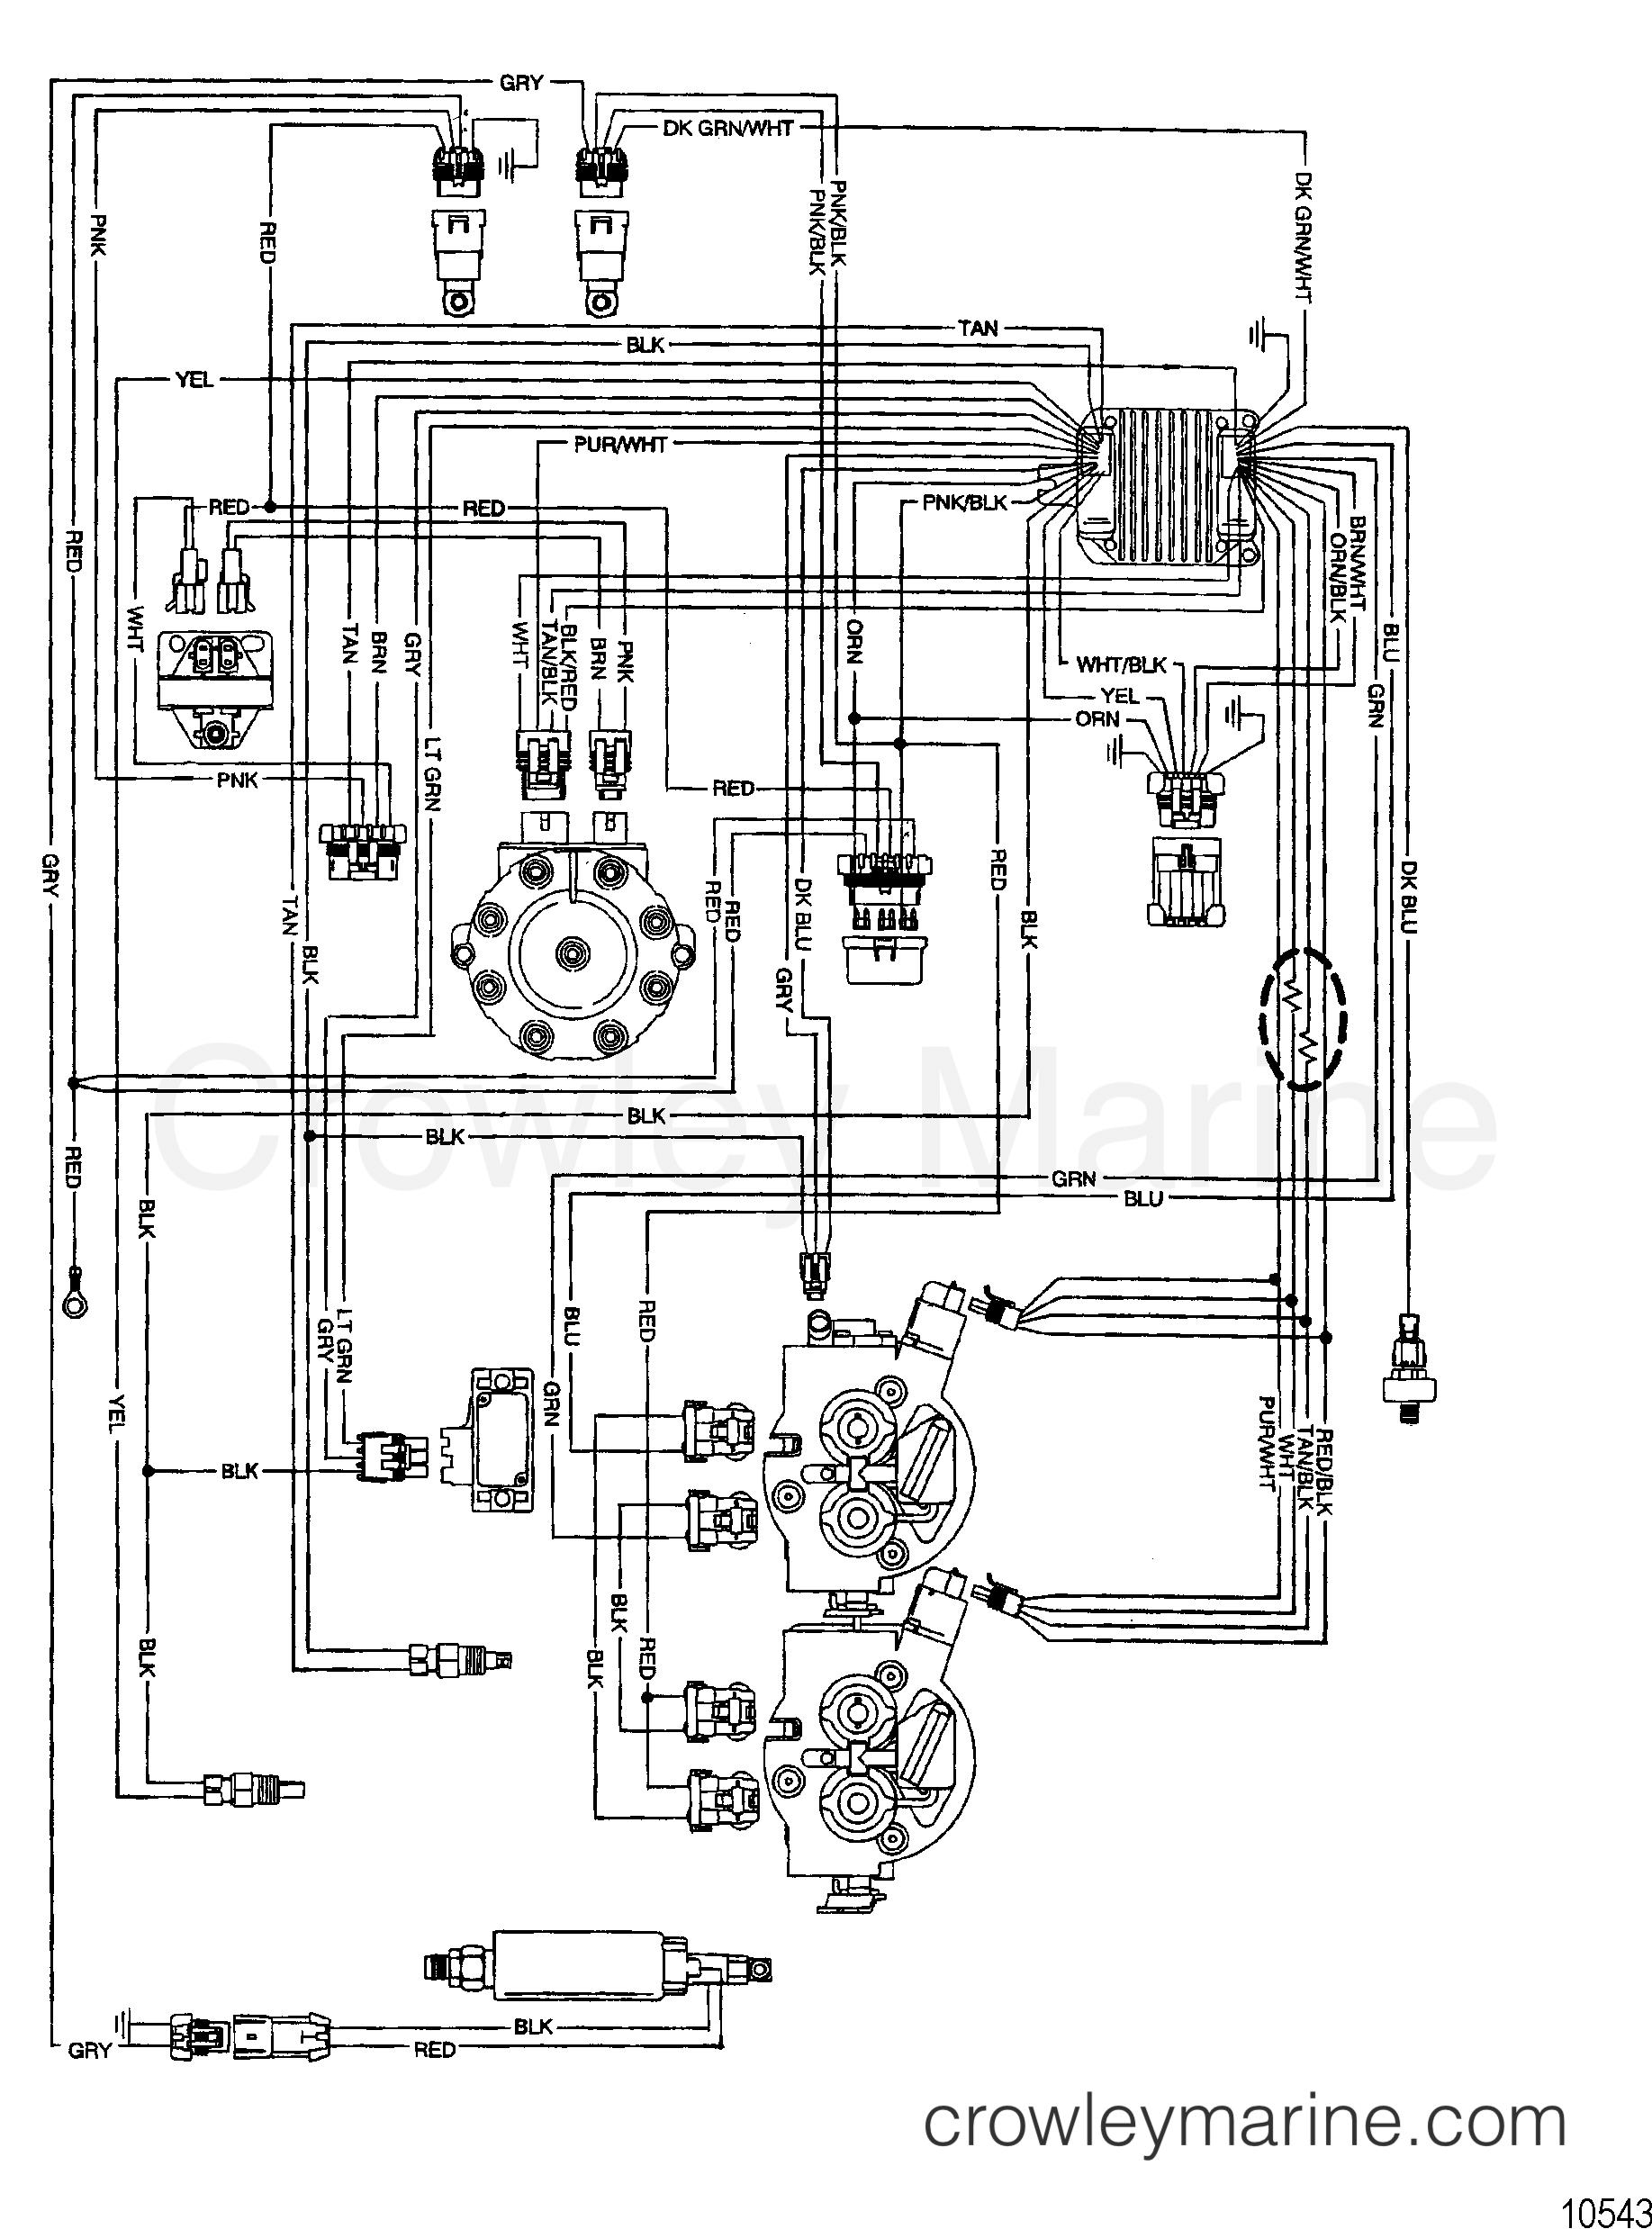 HARNESS ASSEMBLY(EFI WIRING) - 2003 Mercruiser Race Sterndrive 575 ...